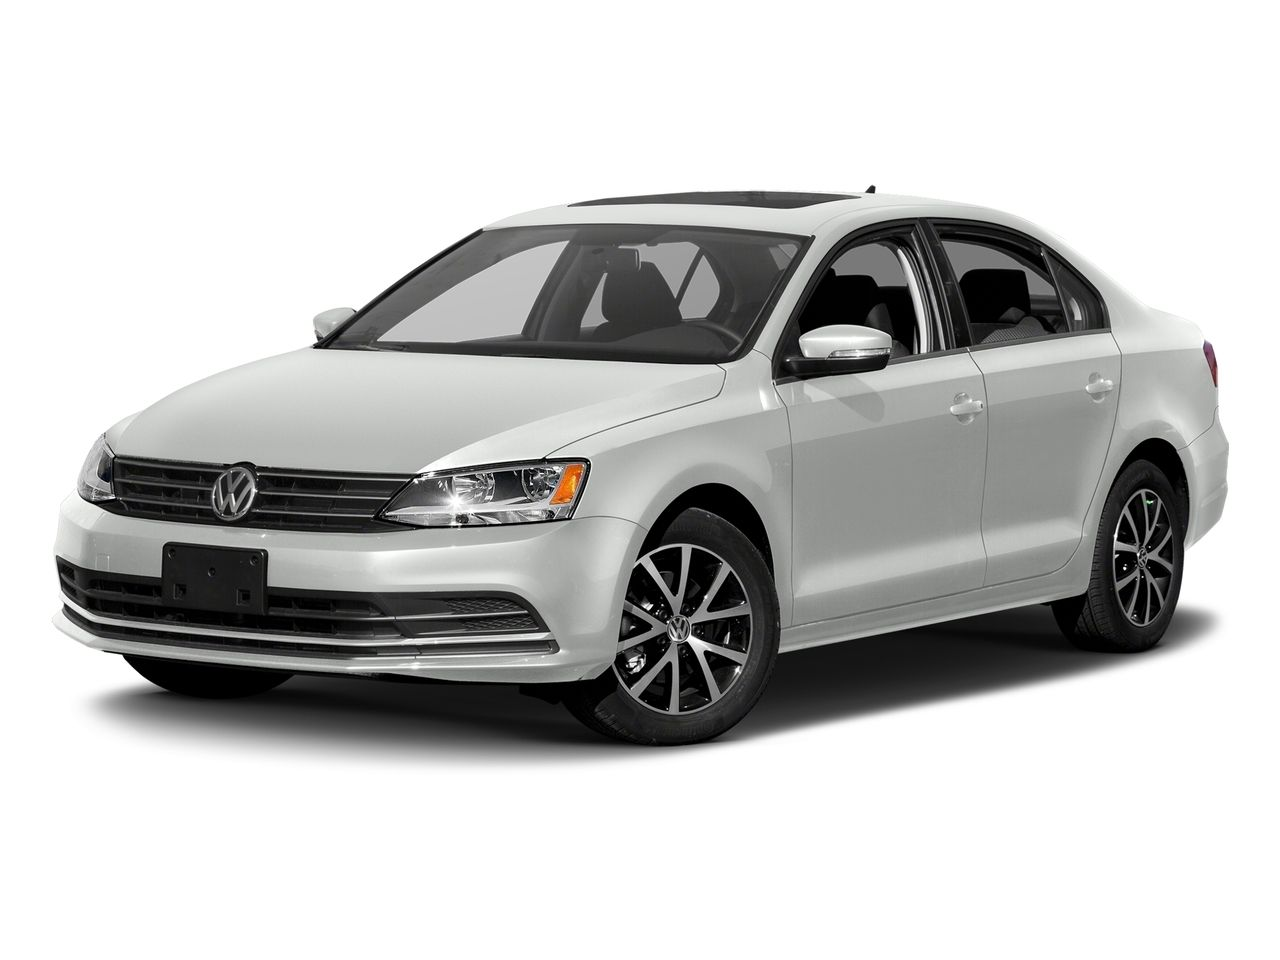 2016 Volkswagen Jetta Sedan Image